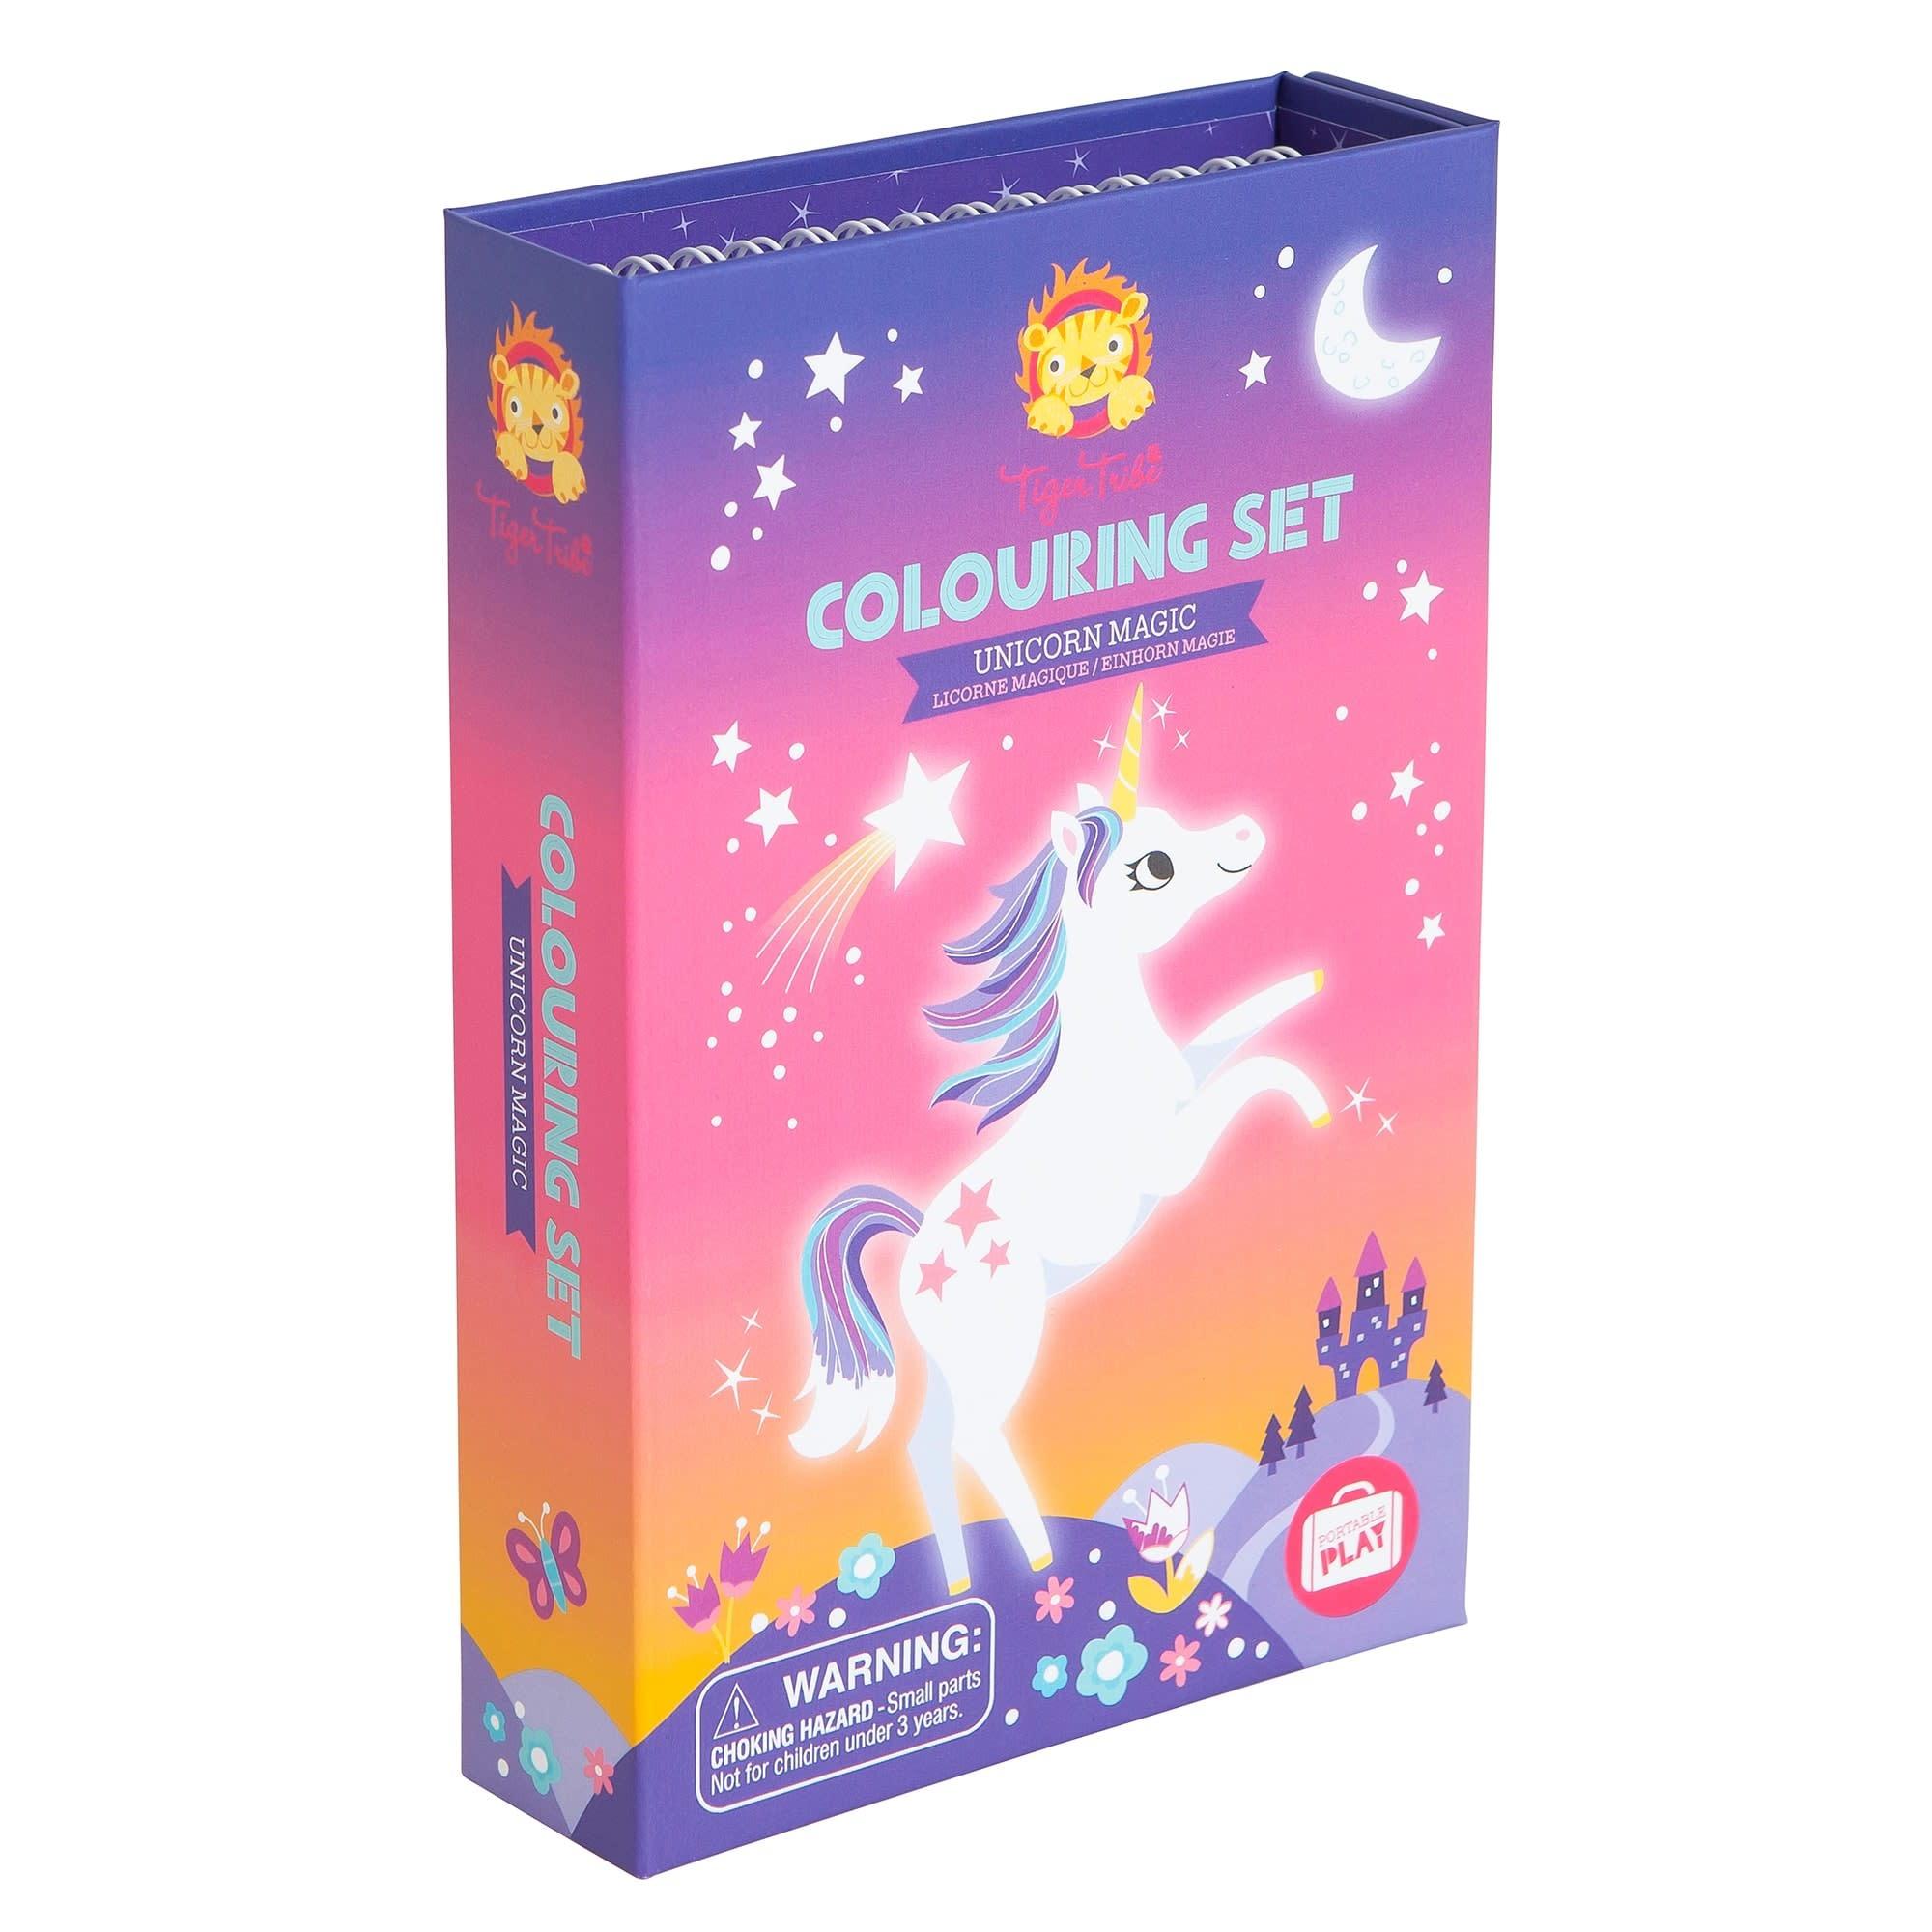 Schylling Coloring Set: Unicorn Magic